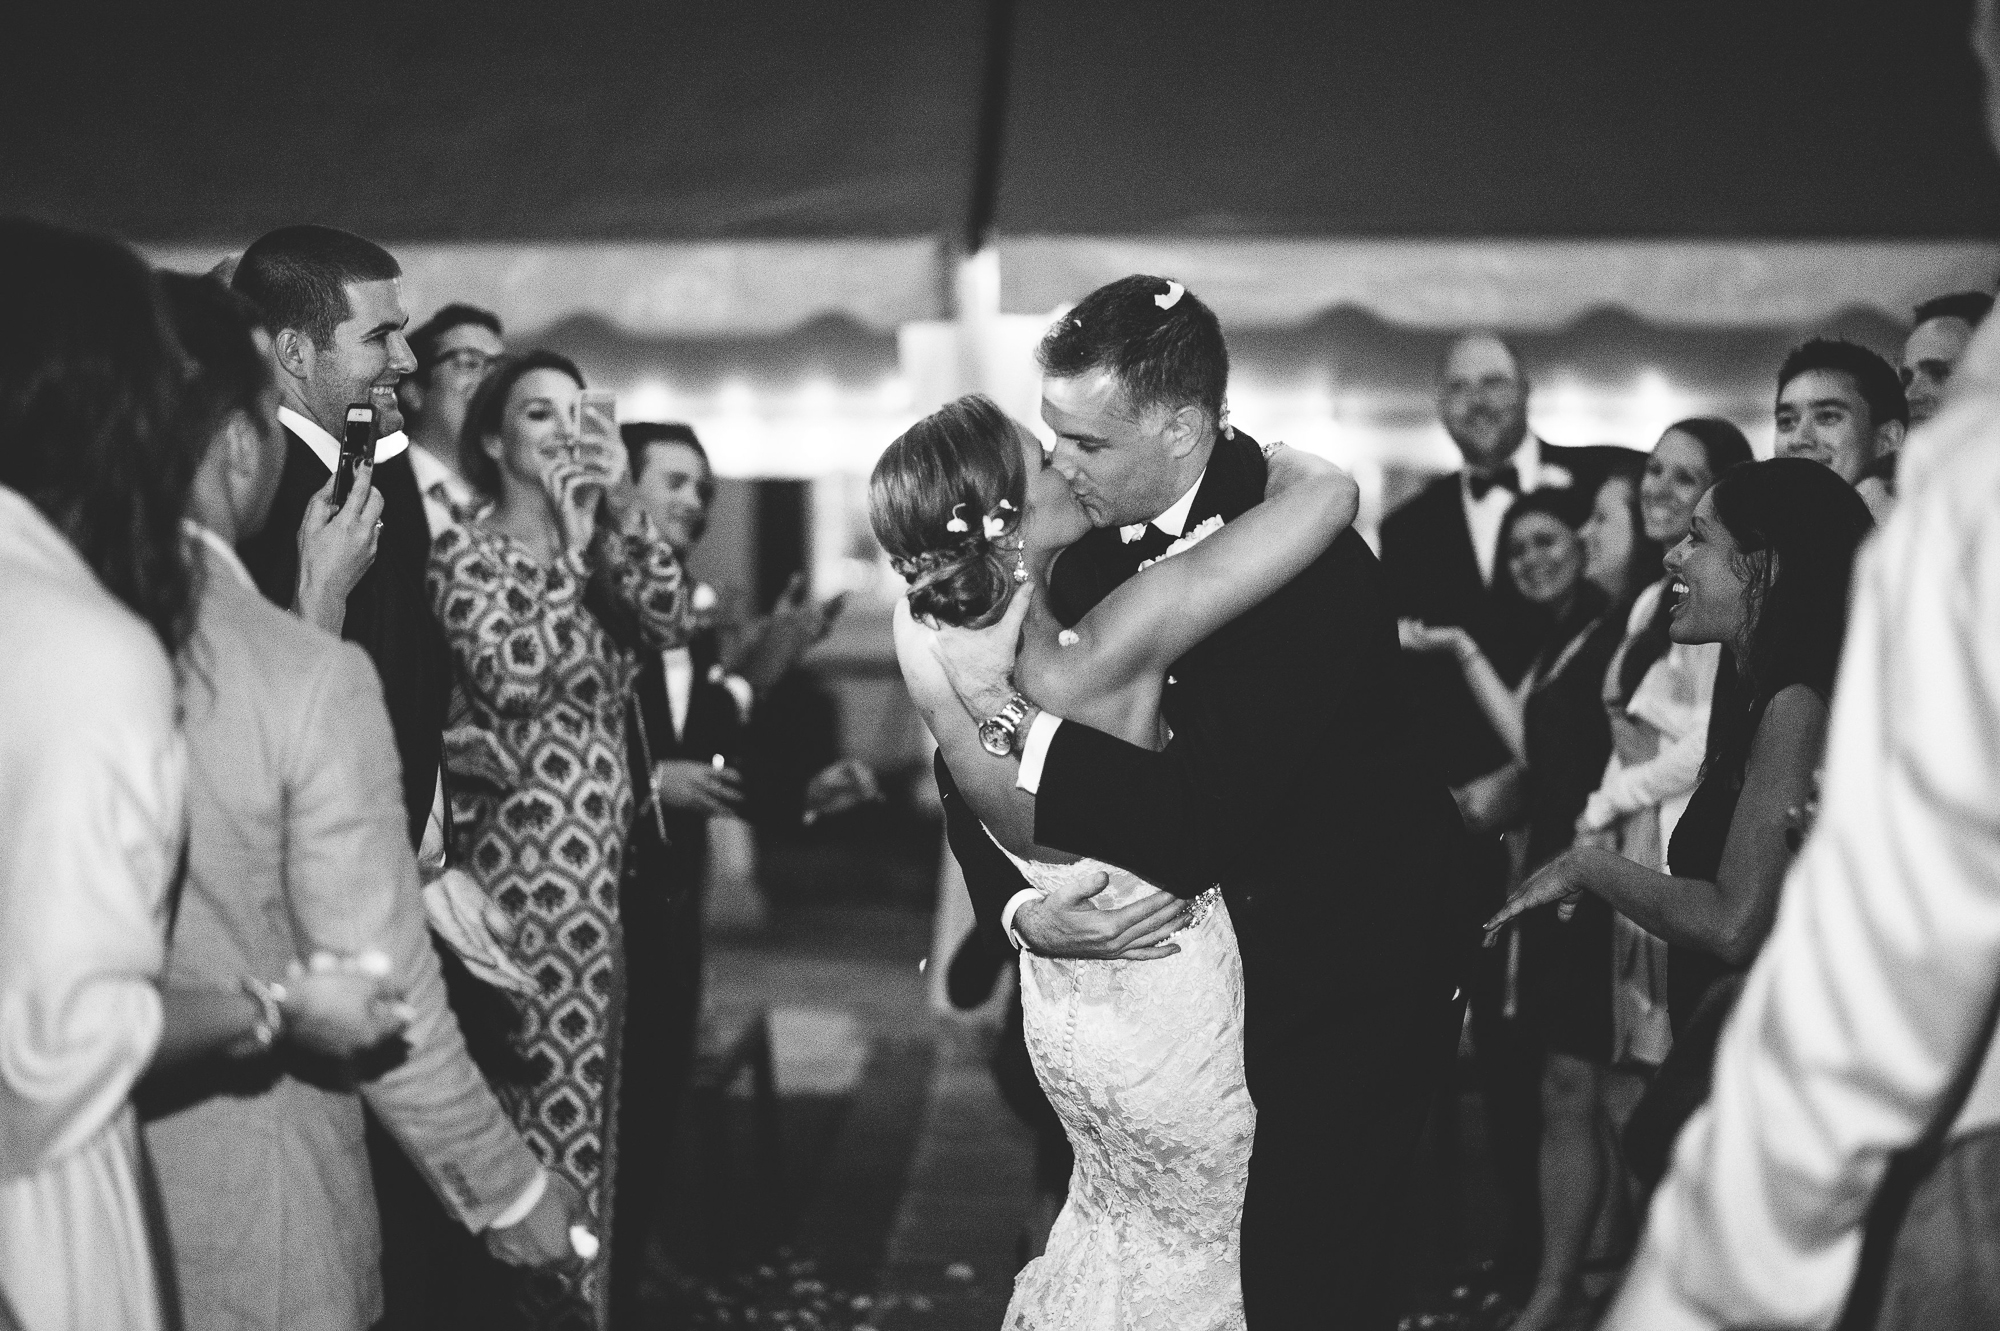 Legare Waring House wedding in Charleston, SC by Aaron & Jillian Photography